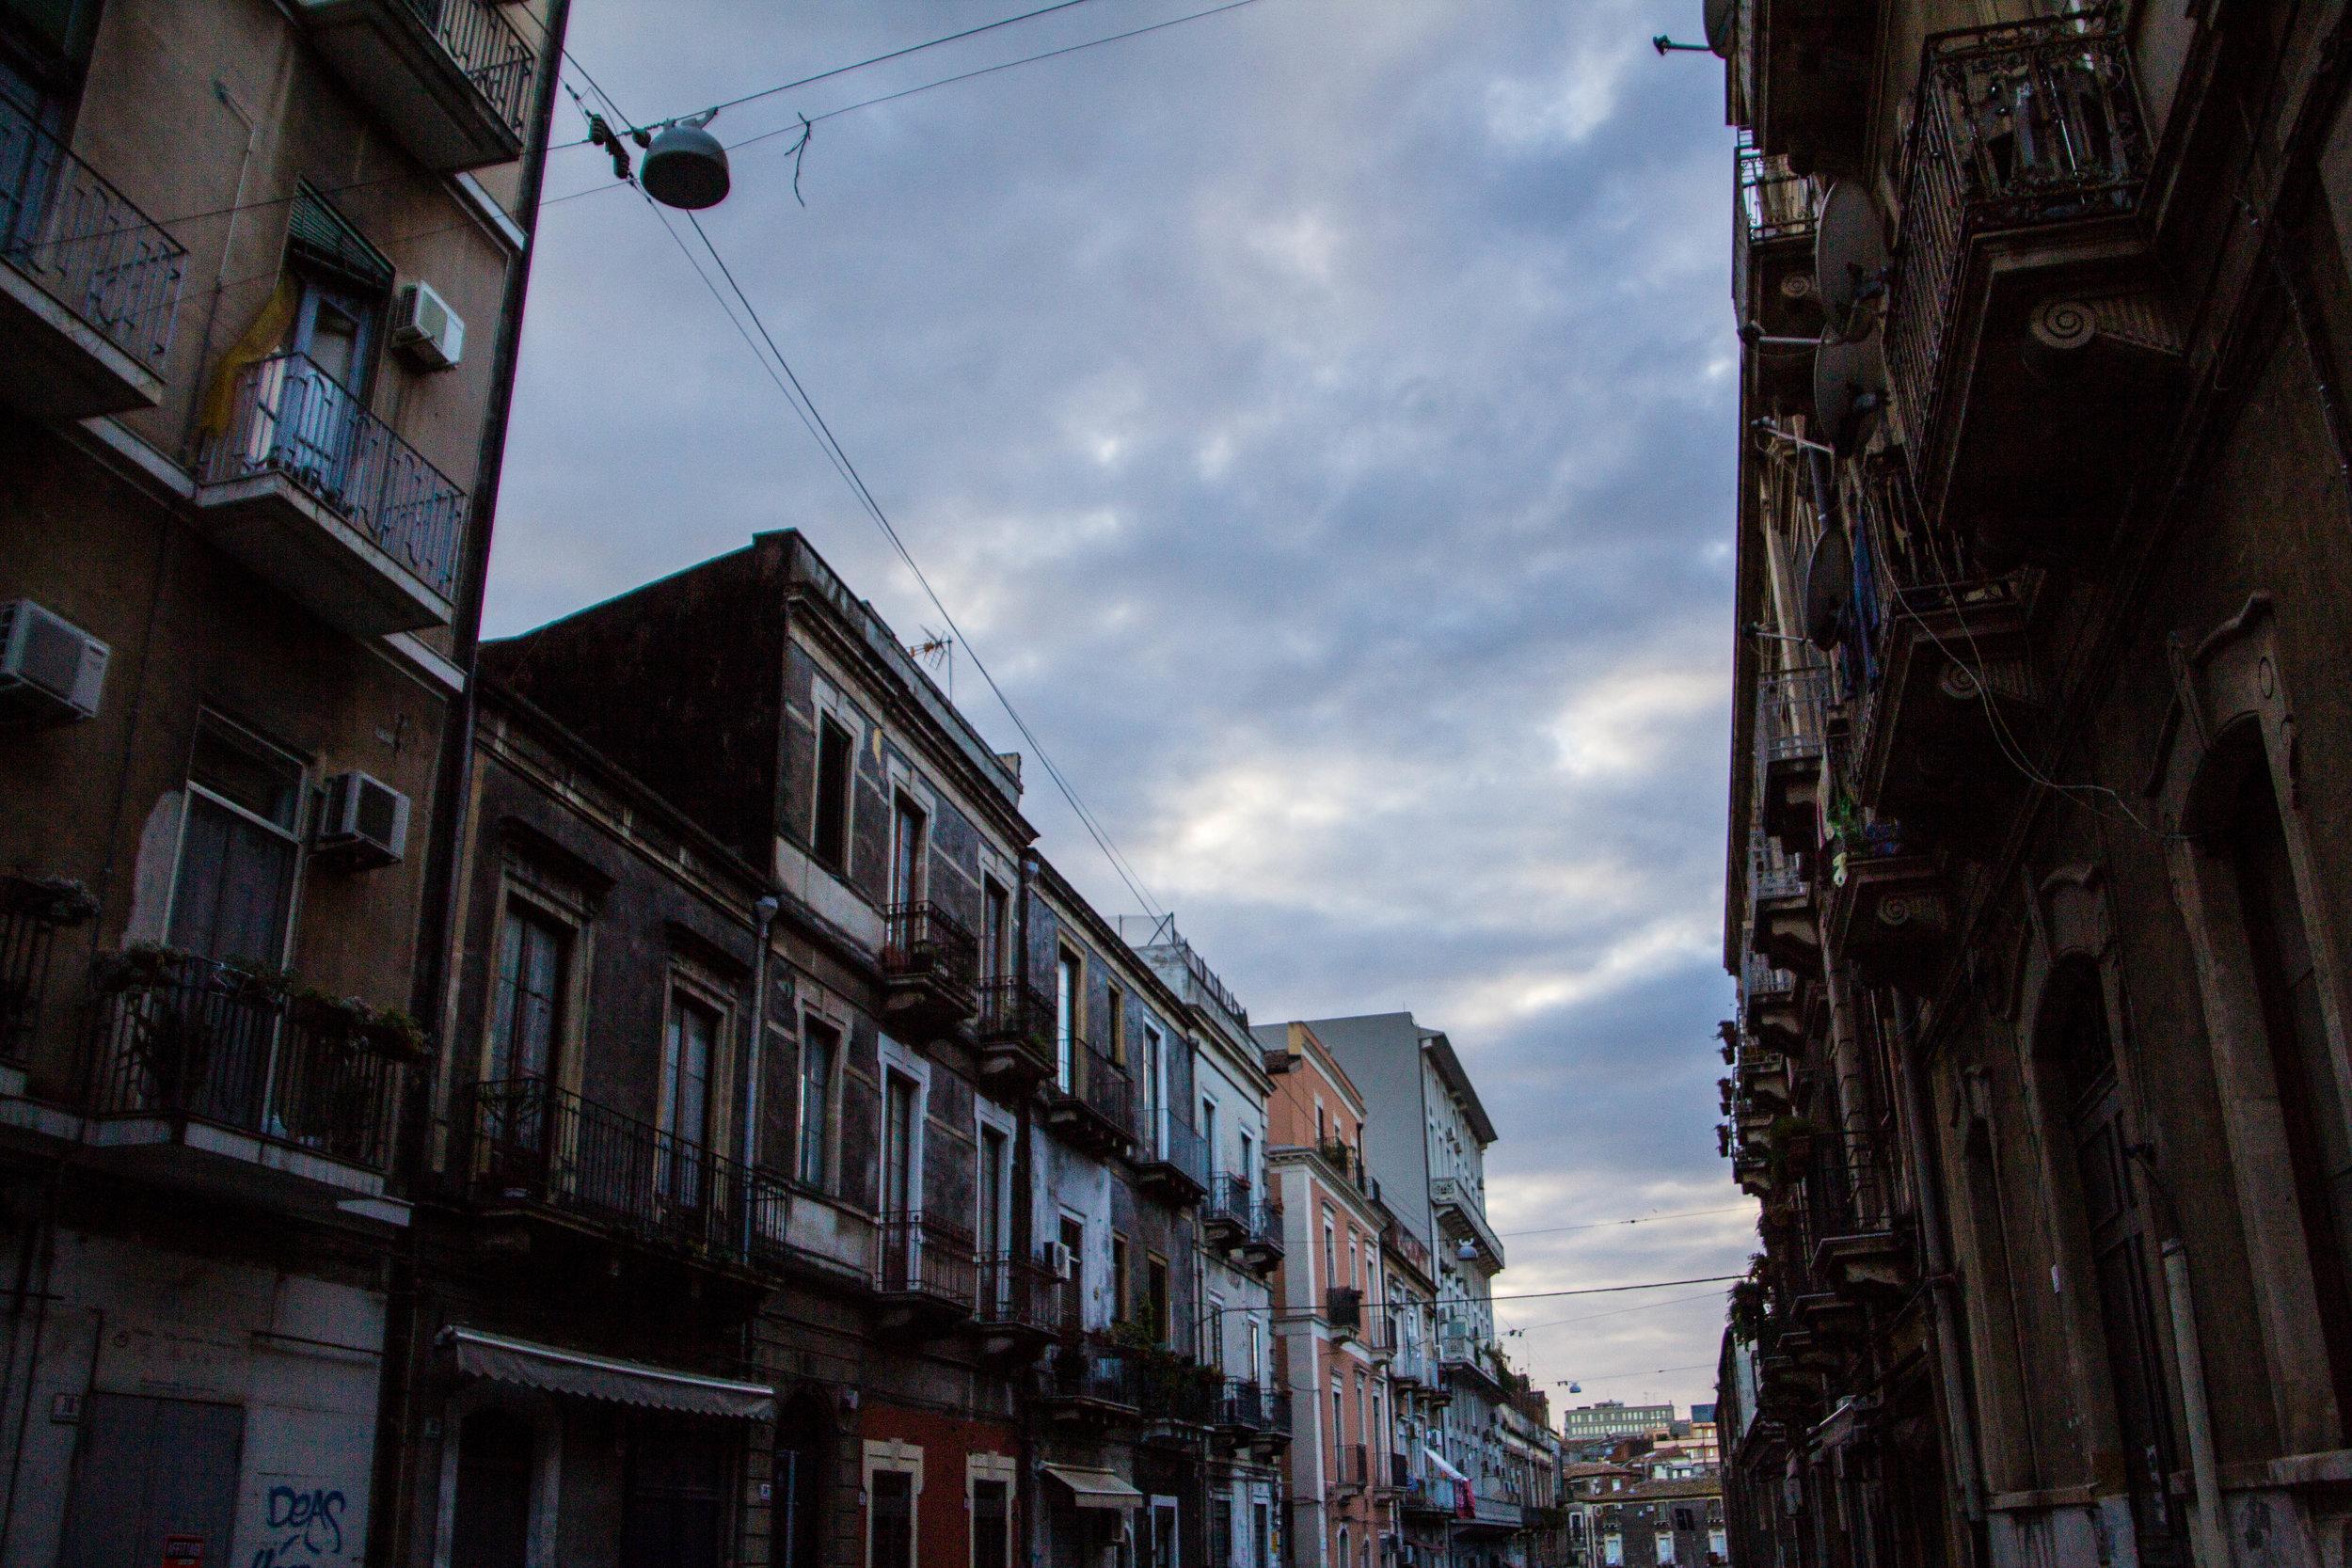 streets-catania-sicily-sicilia-2.jpg